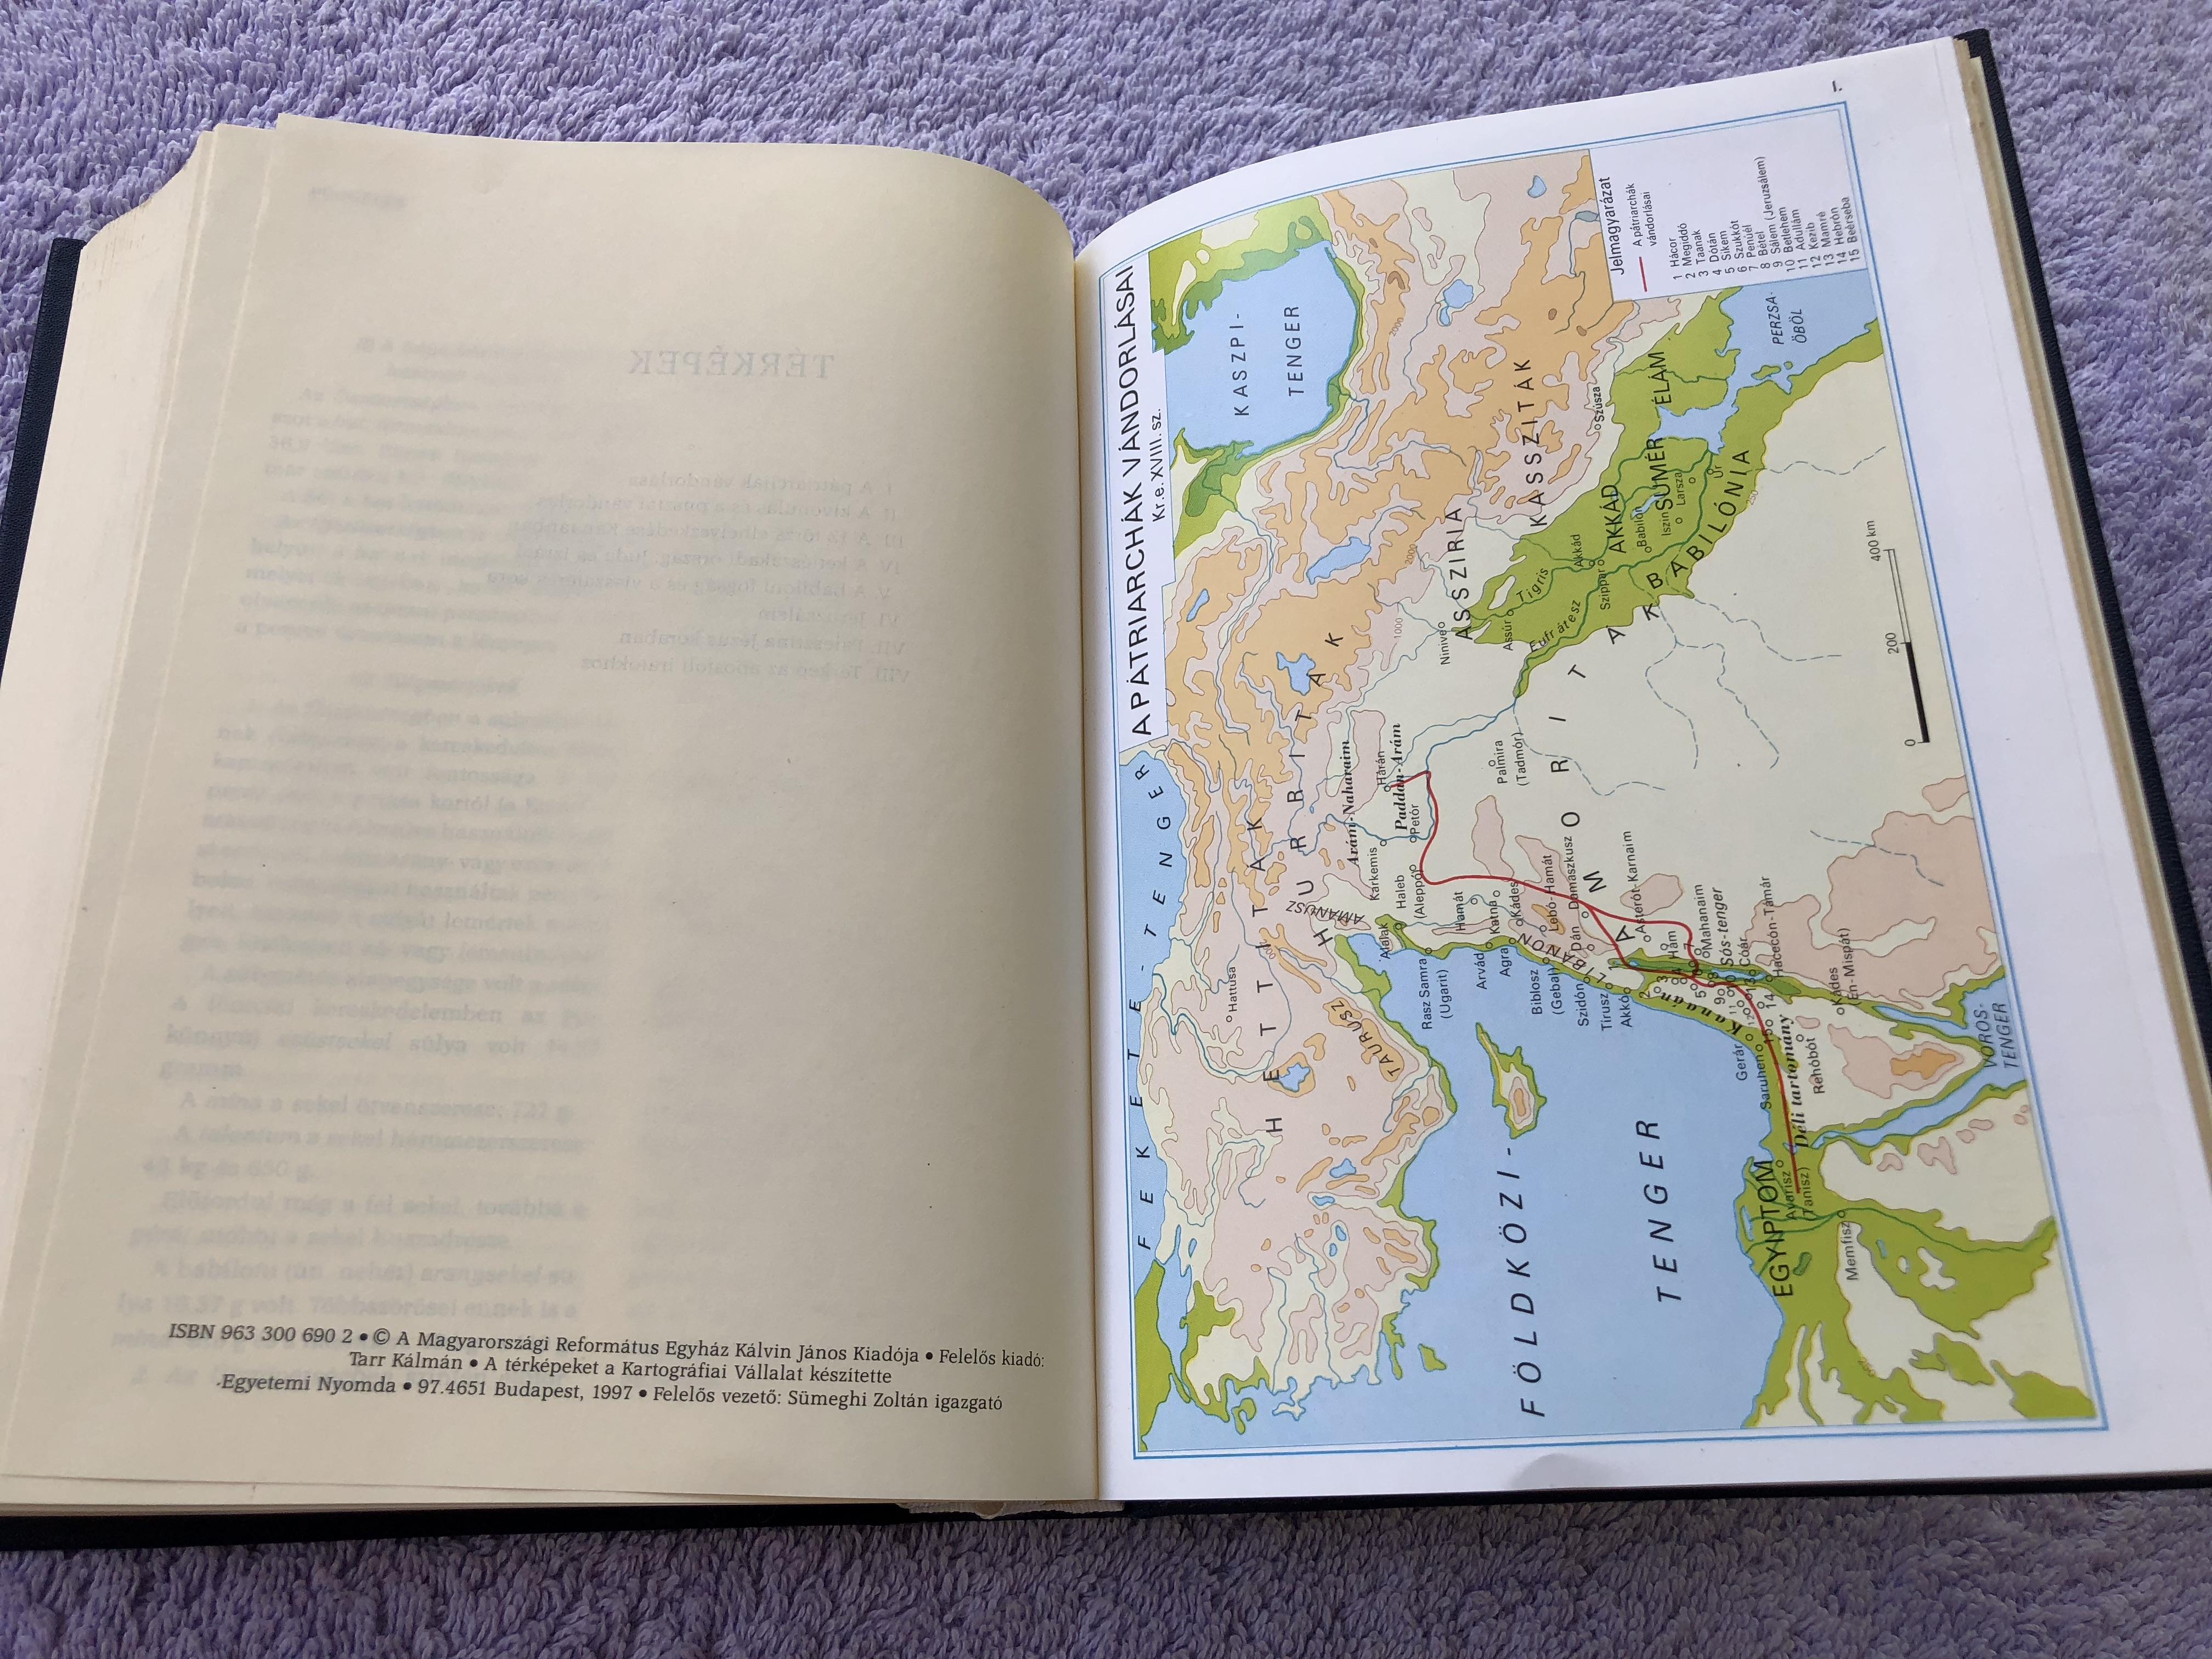 biblia-hungarian-protestant-bible-1997-print-15-.jpg